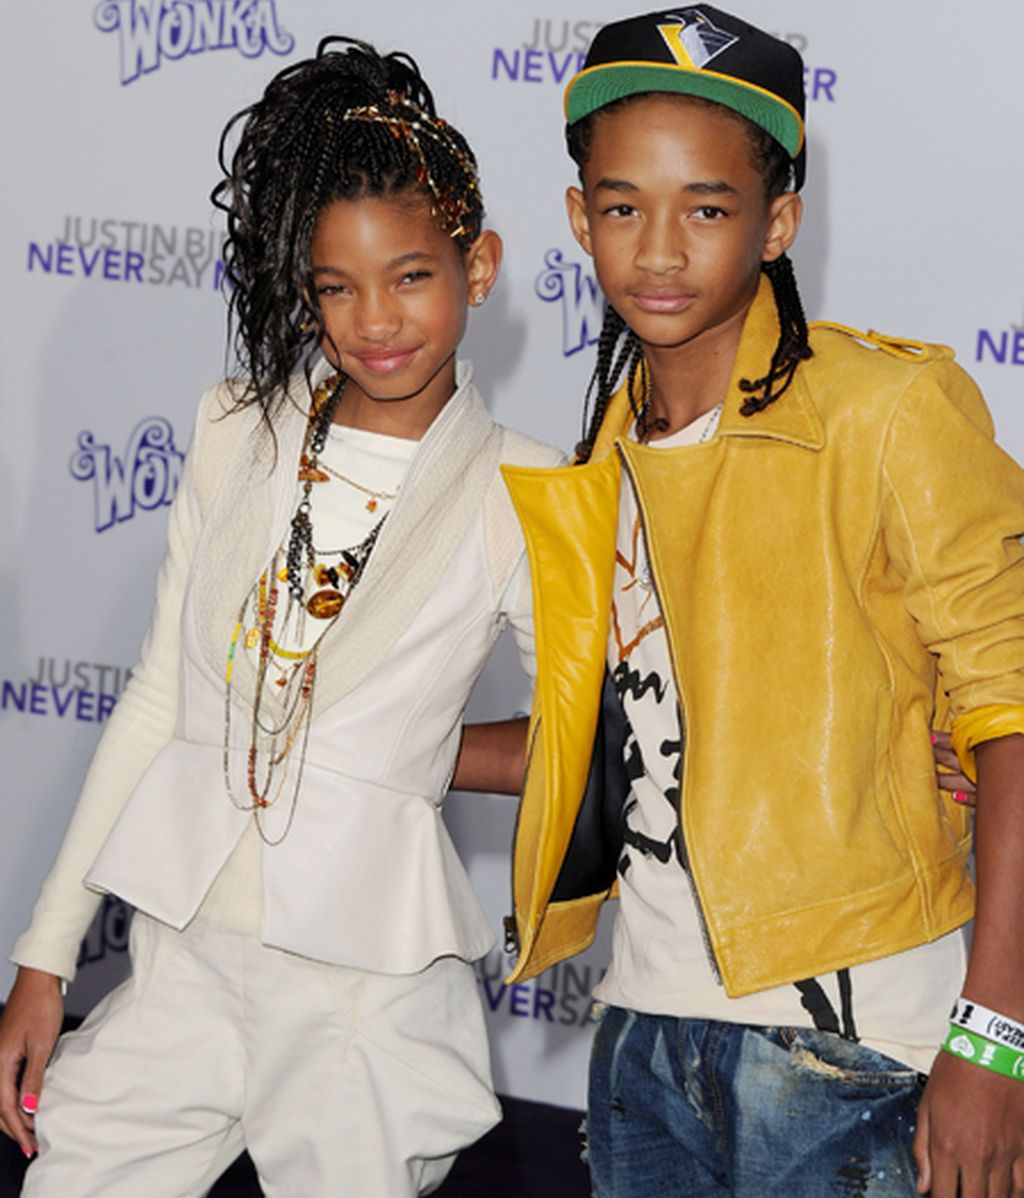 Willow y Jaden Smith